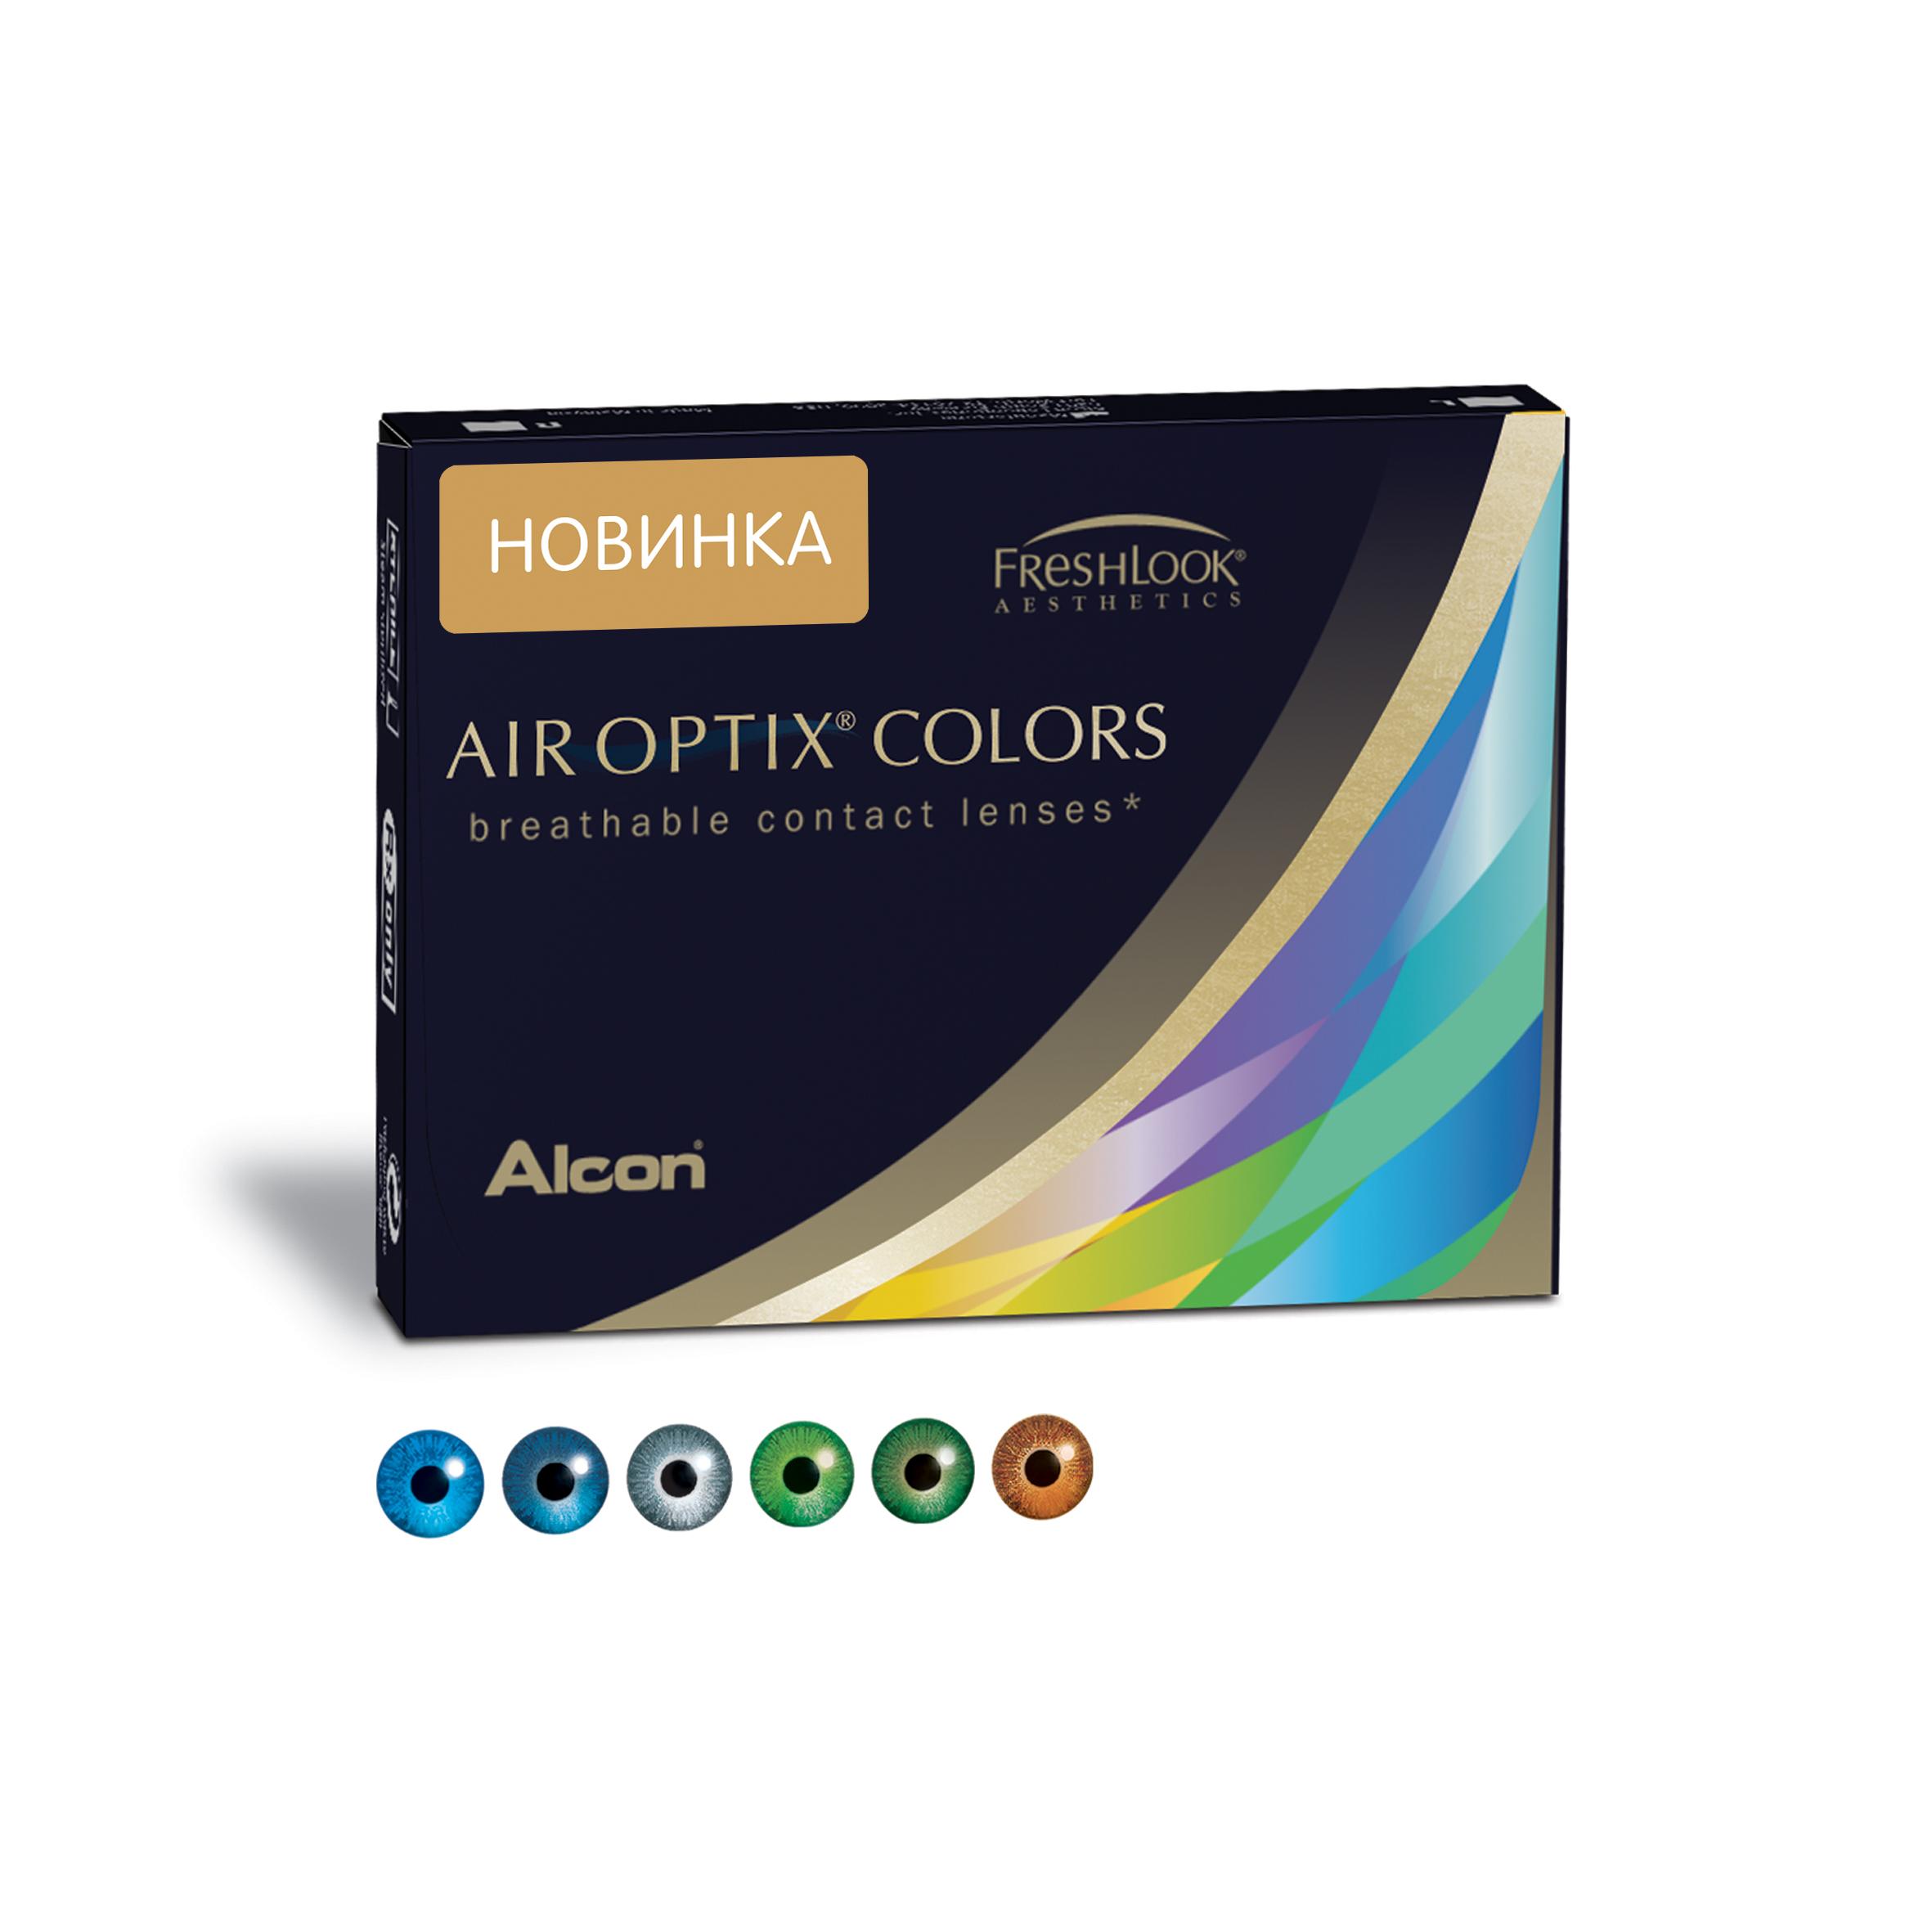 Аlcon контактные линзы Air Optix Colors 2 шт -6.50 Gemstone Green31746313Мягкие контактные линзы